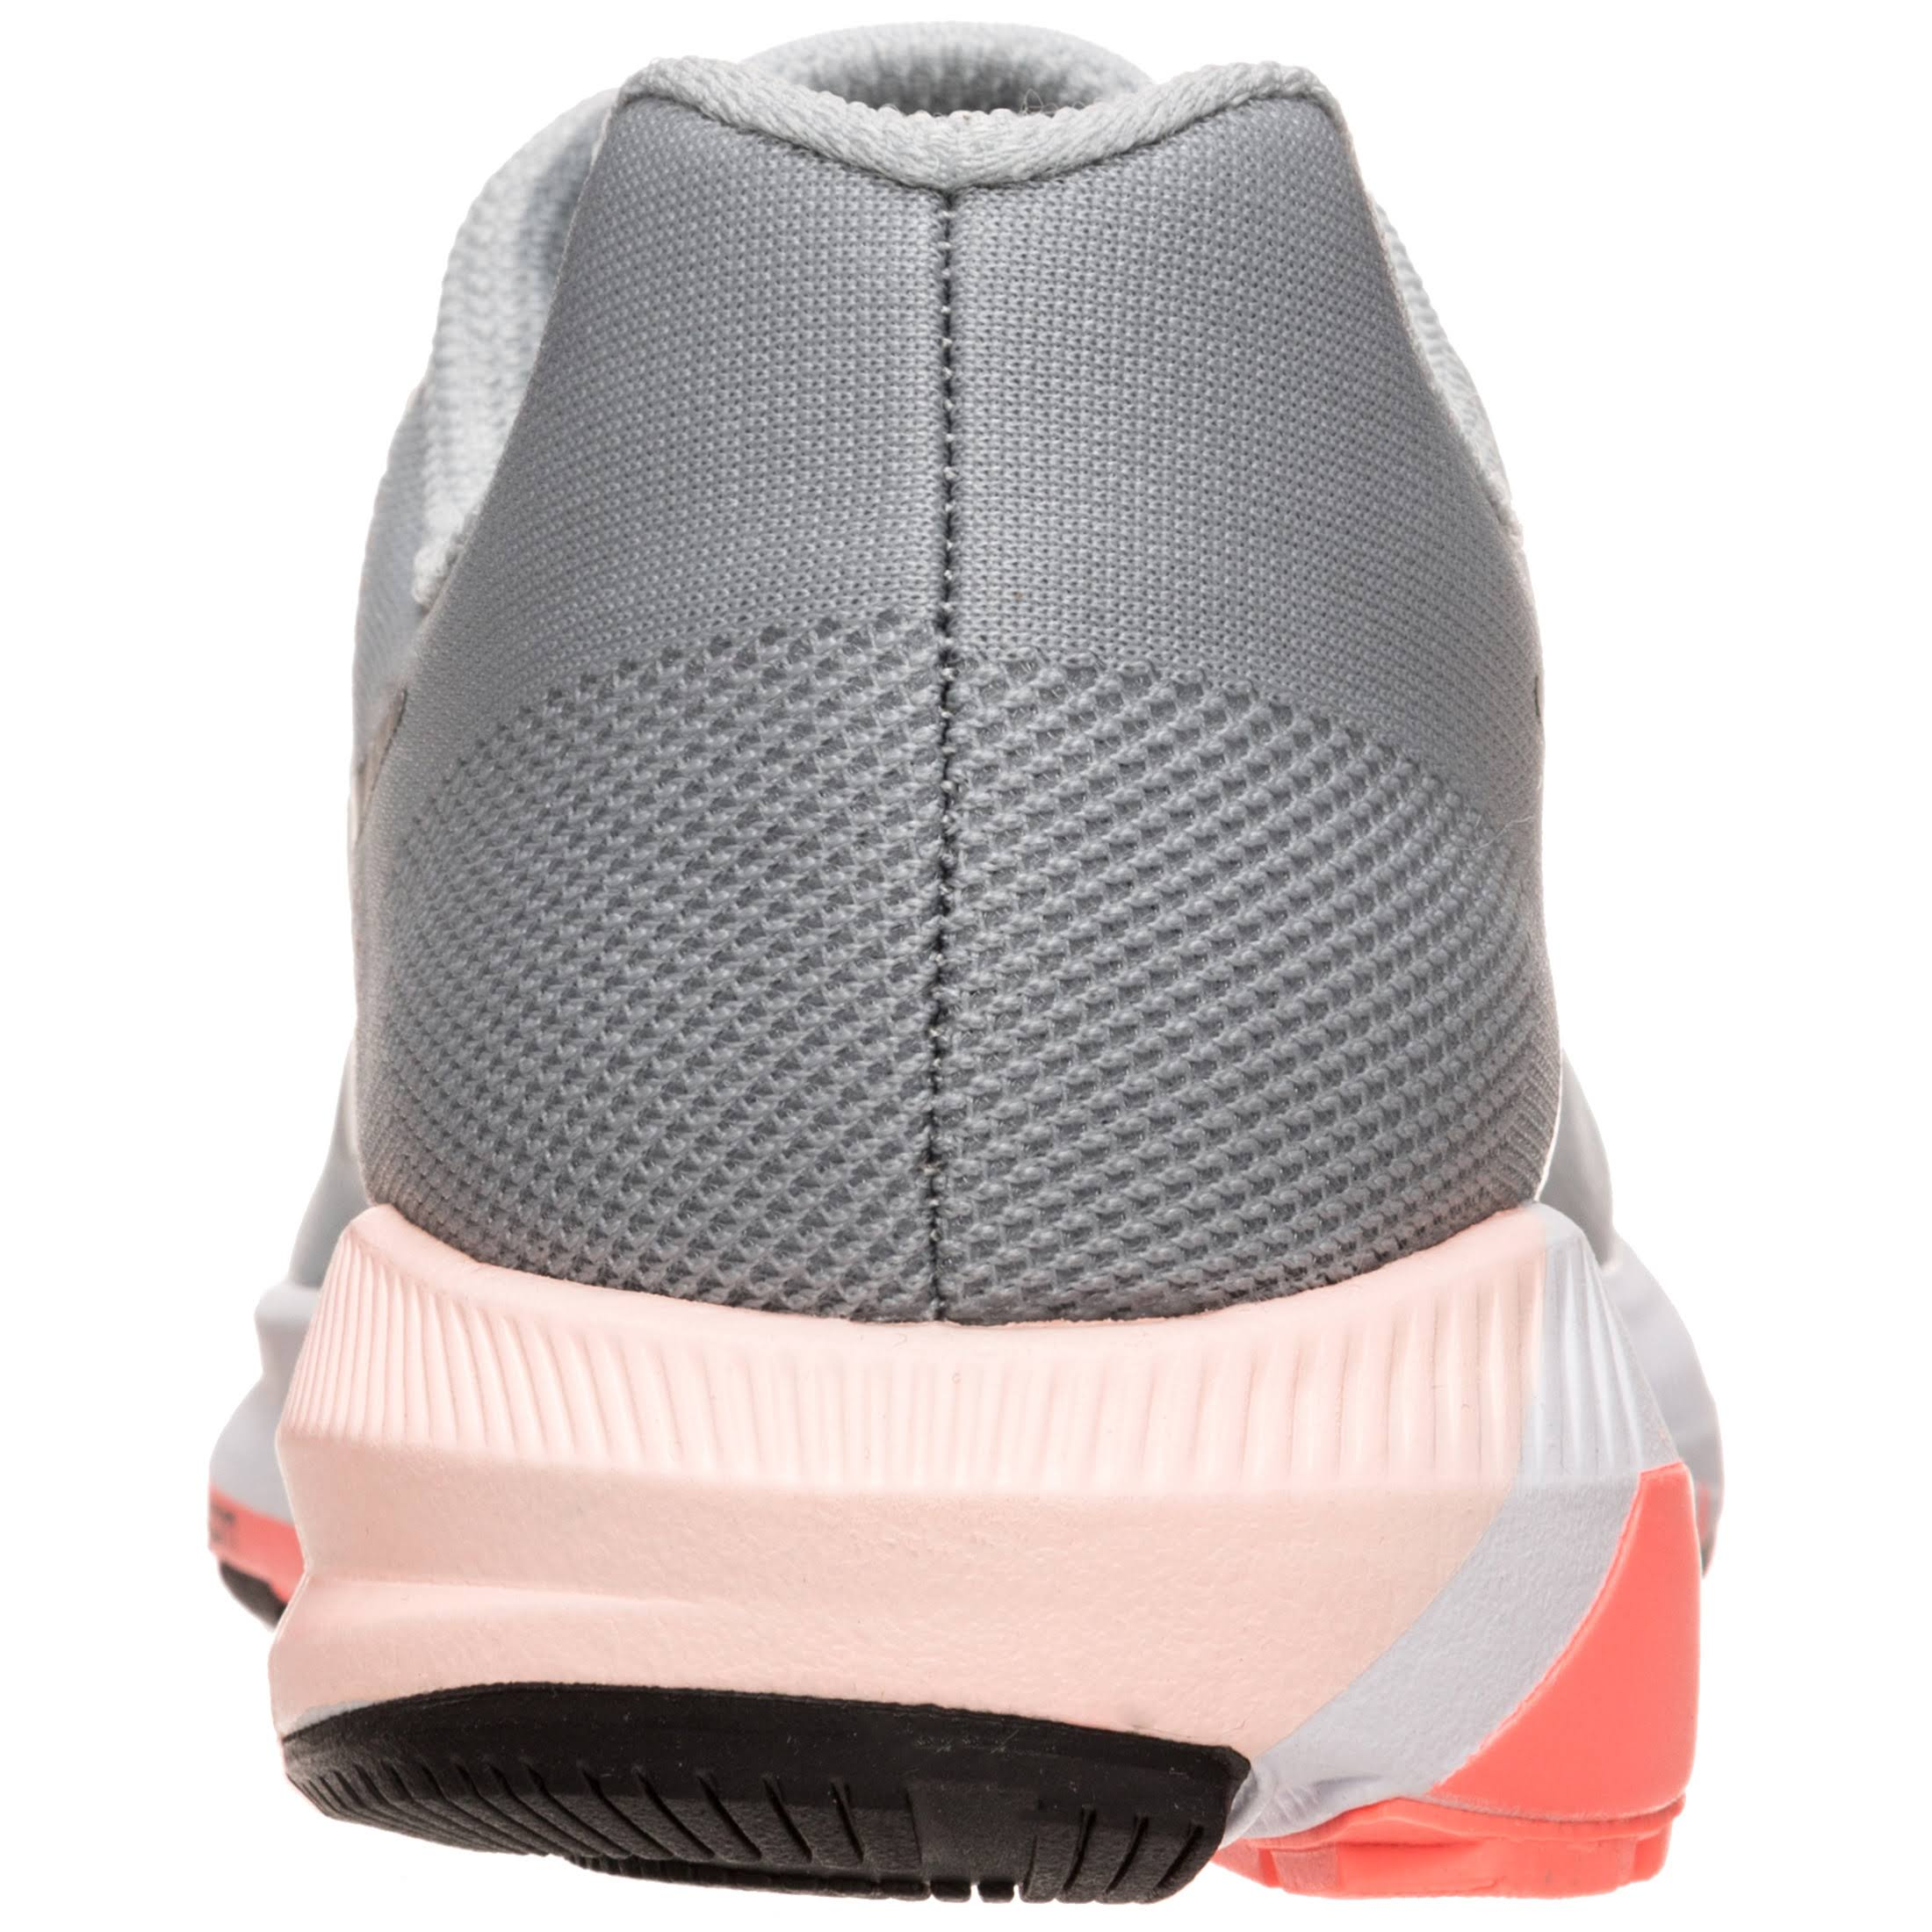 Air 904701008 Größe 21 Nike 36 Zoom W 5 Structure Grau Koralle Schuhe qZYwnOZfEa